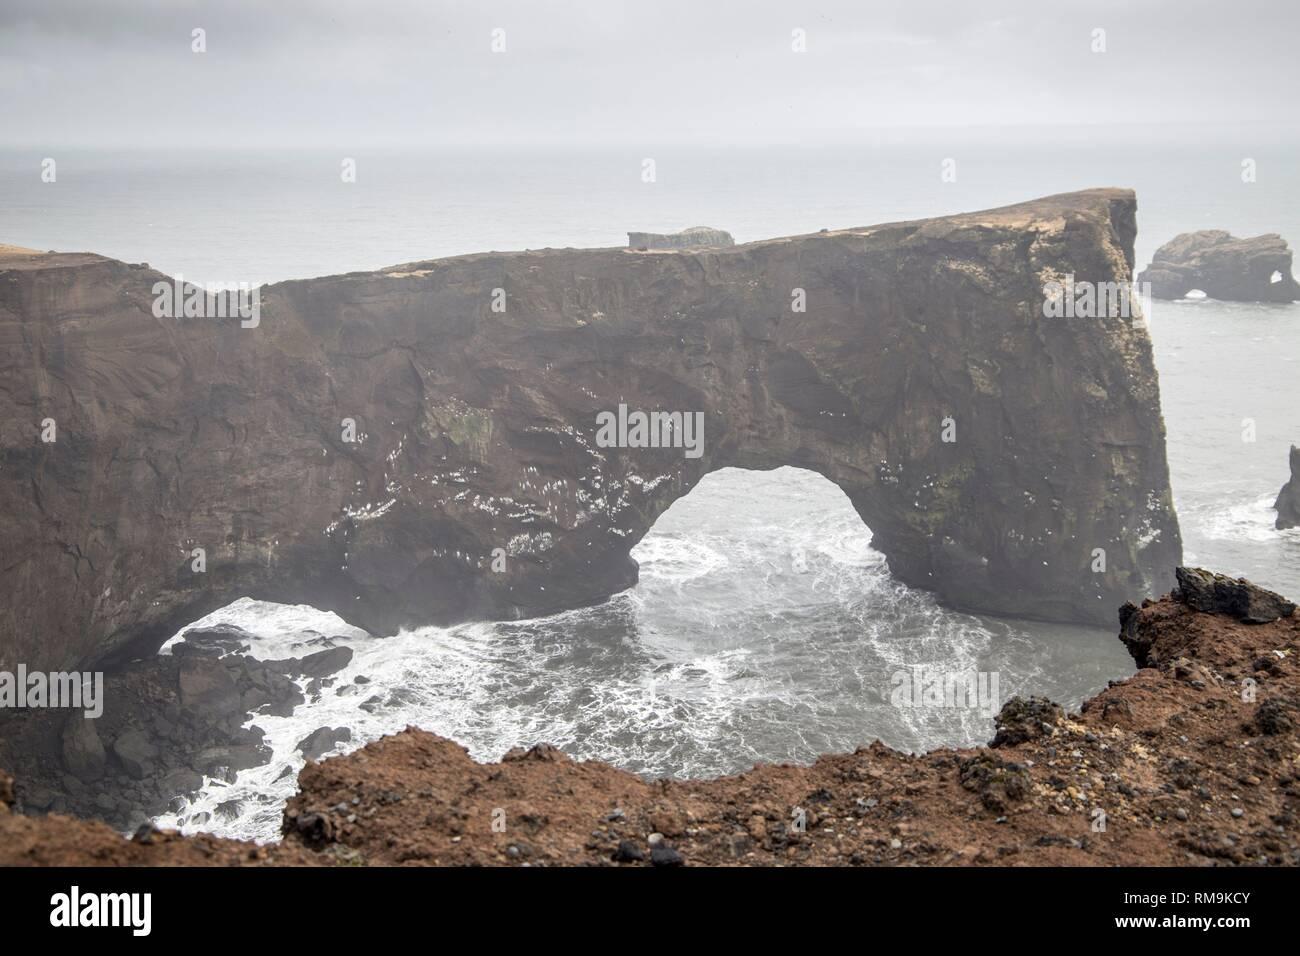 Natural Arch von Dyrholaey Halbinsel - Island. Stockbild